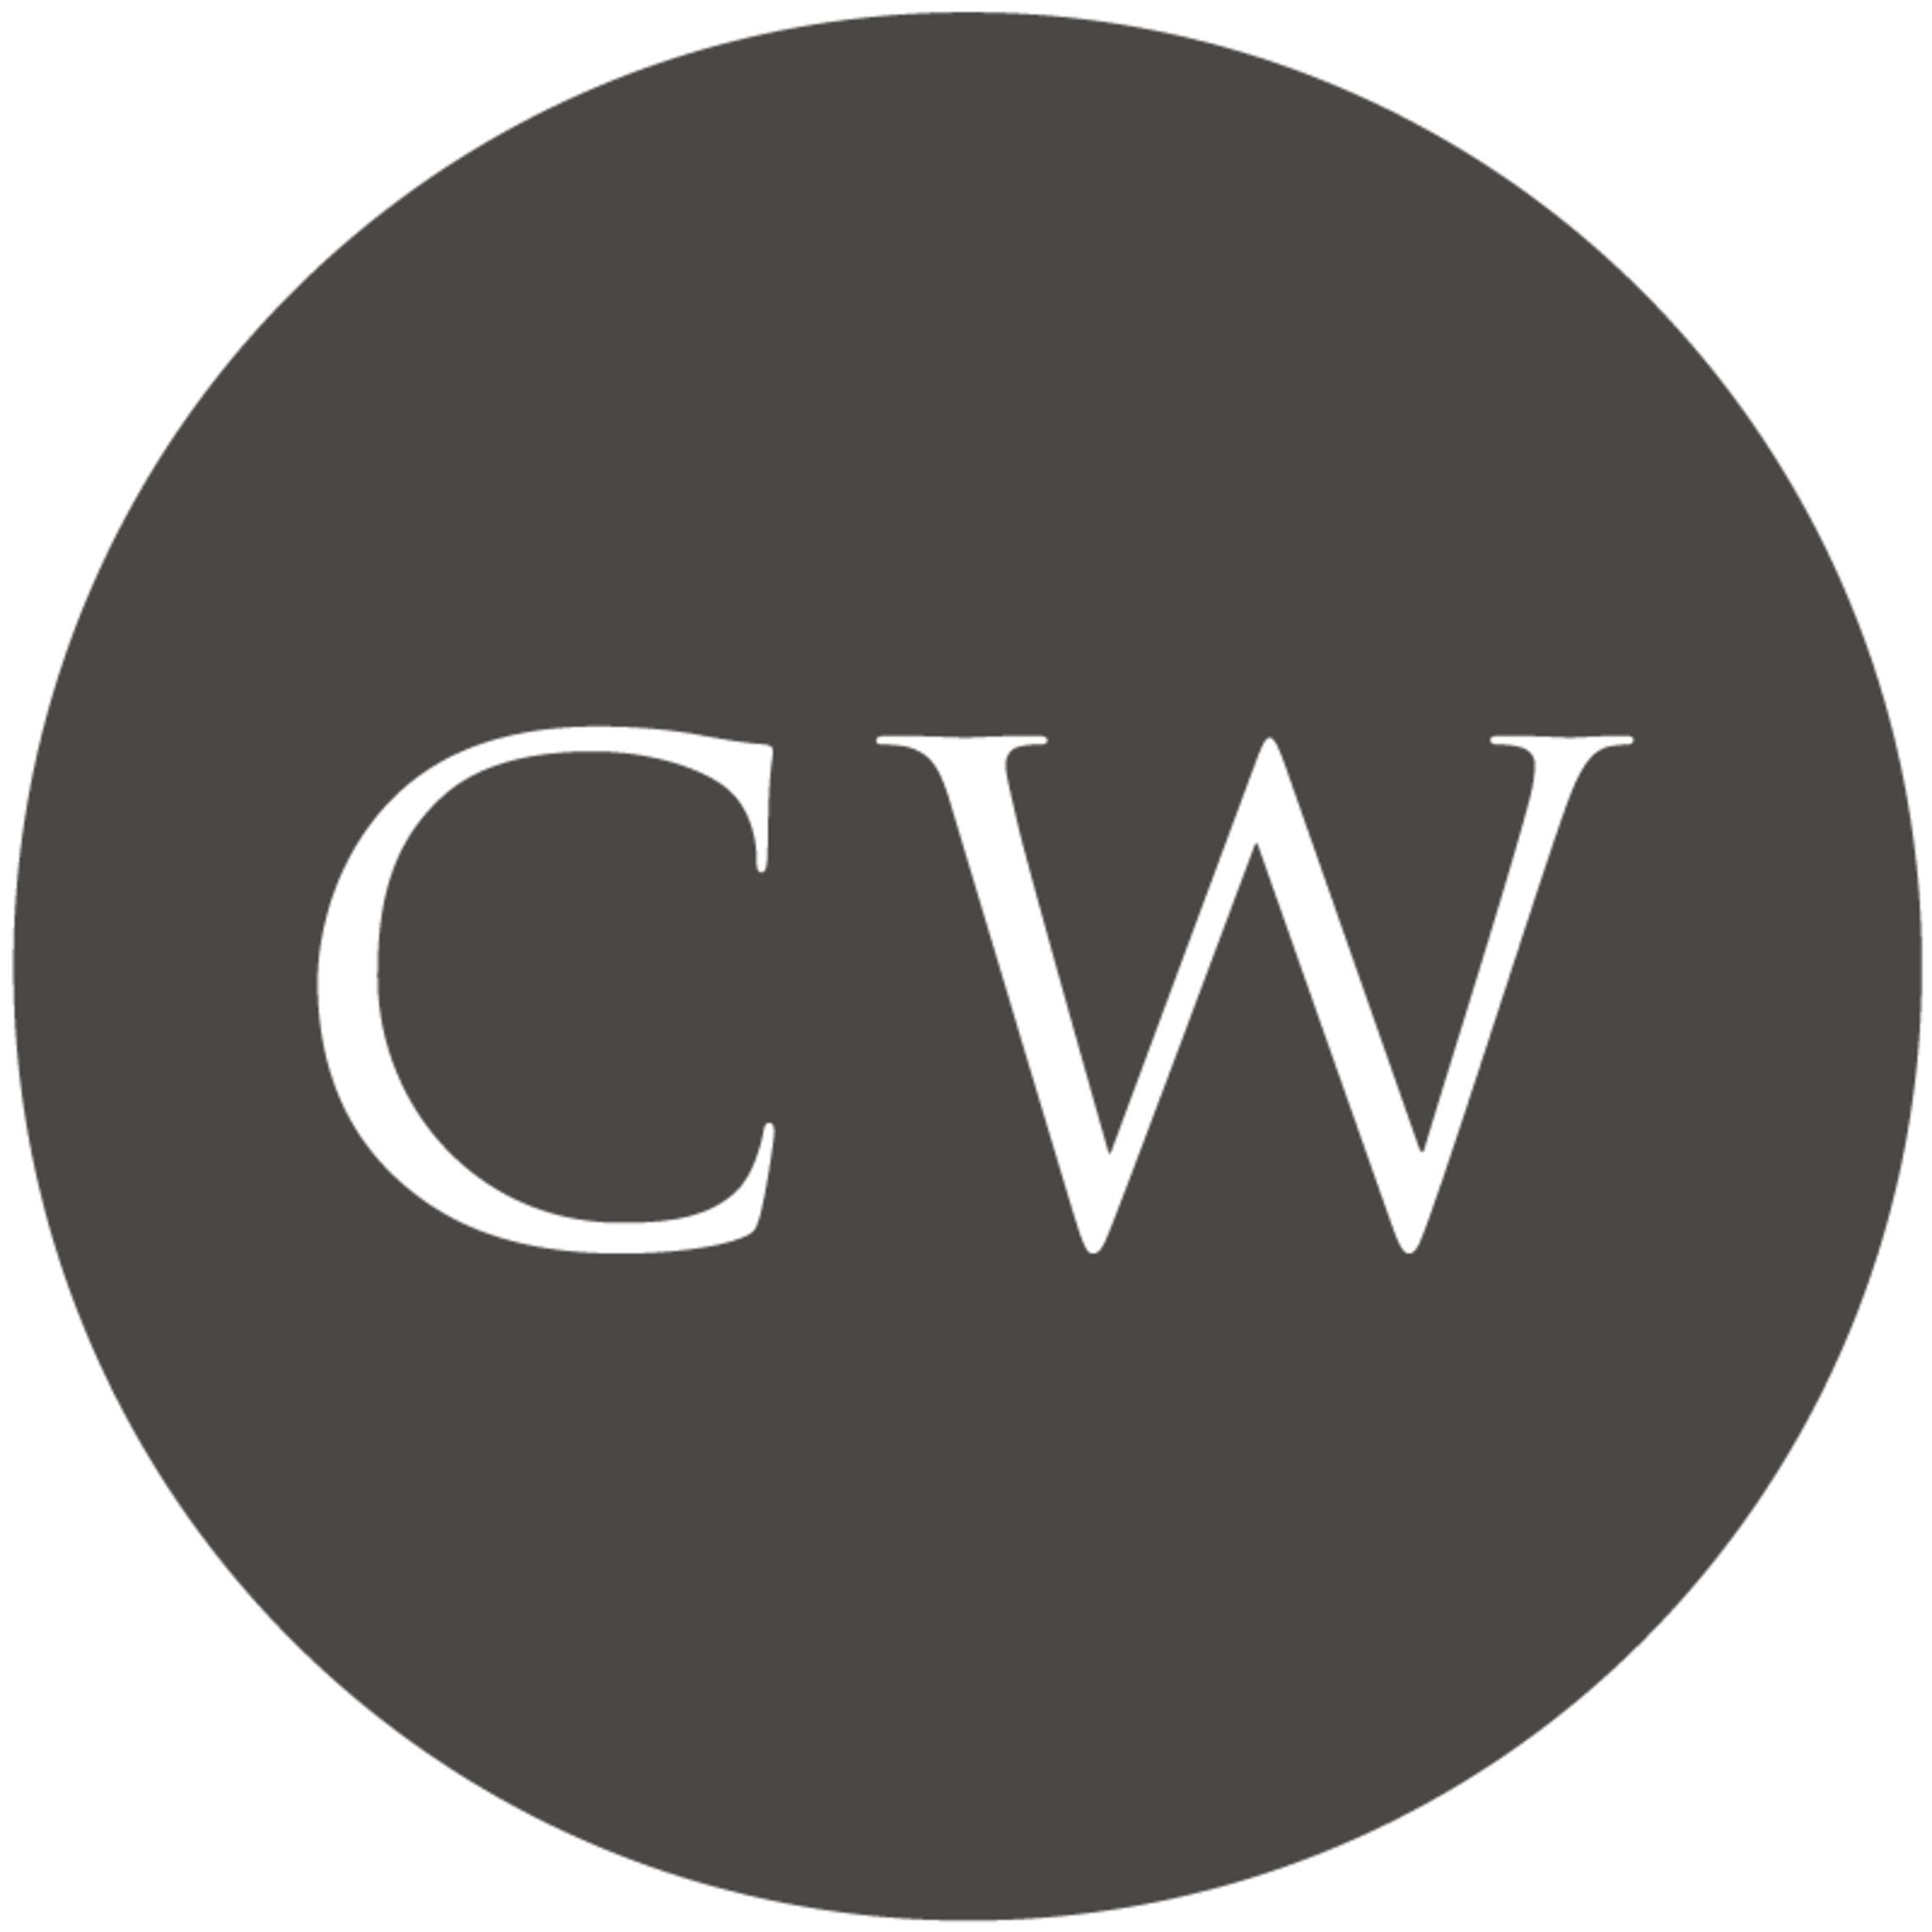 cult wines ltd- company logo